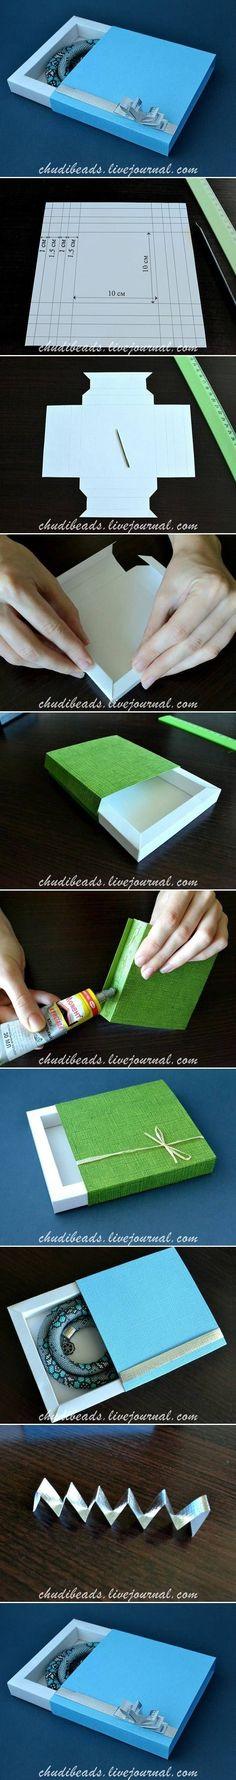 DIY Square Gift Box: